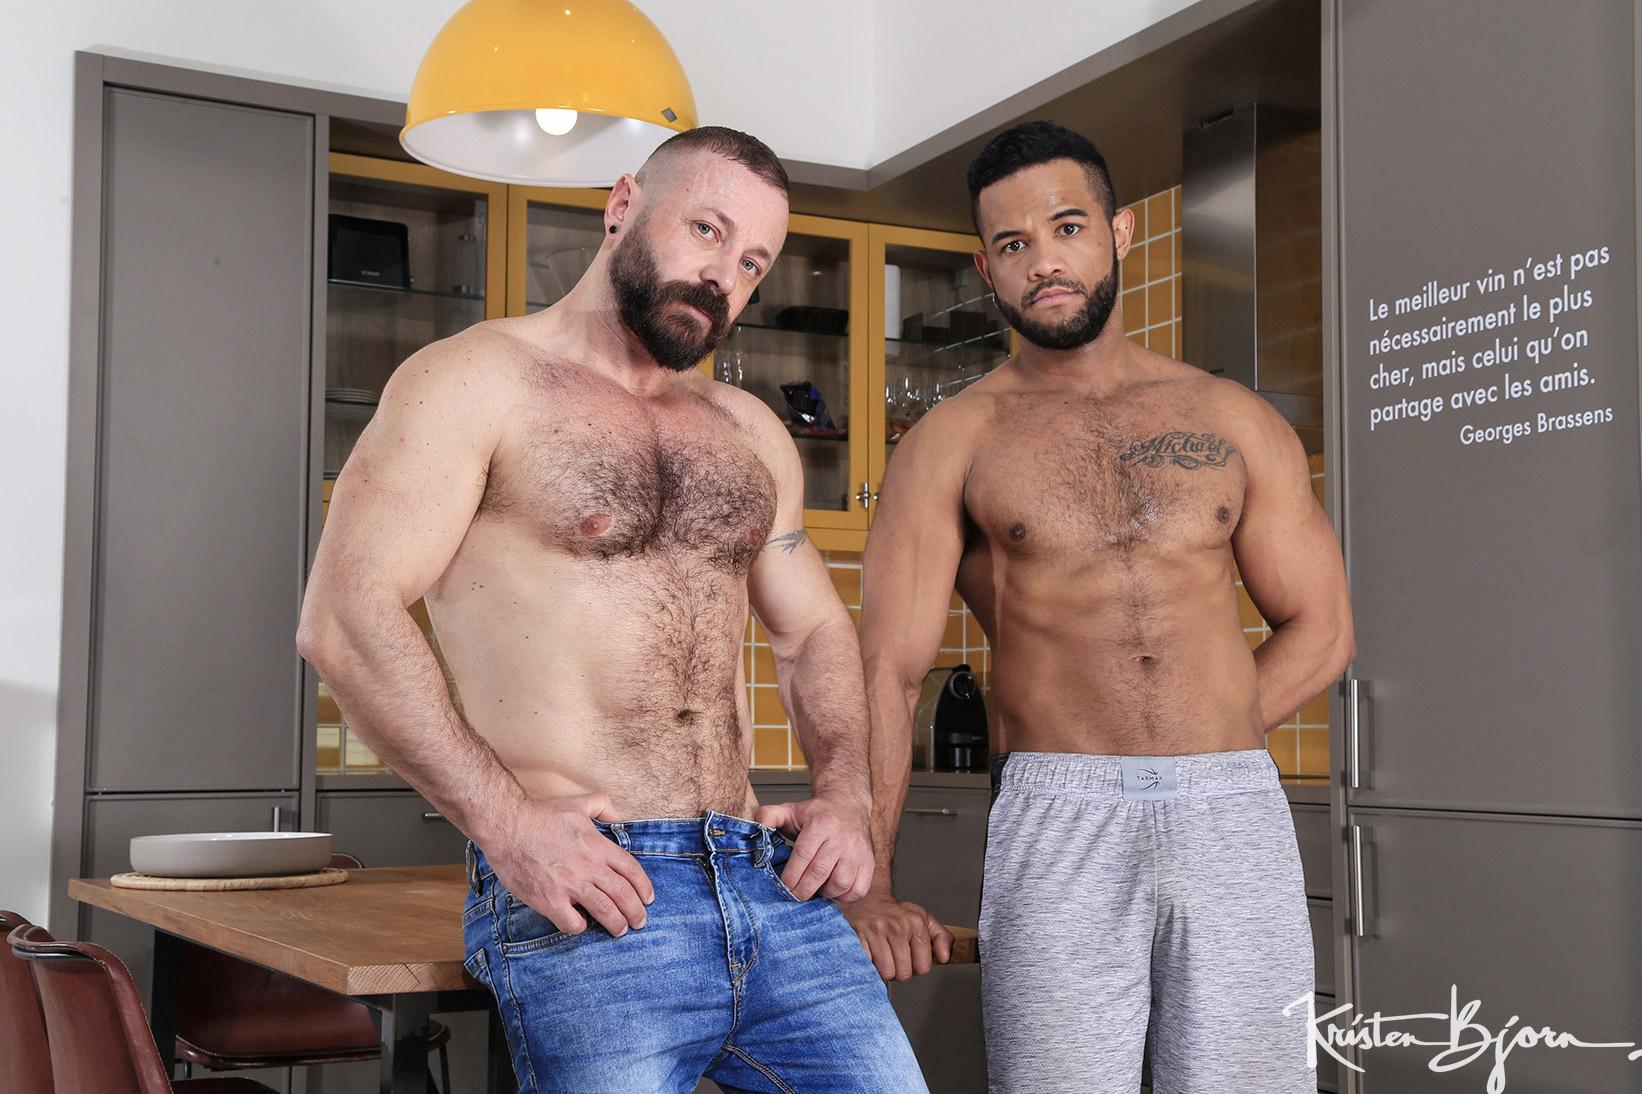 Casting Couch #440: Jonas Brown, Mario Roma - Gallery